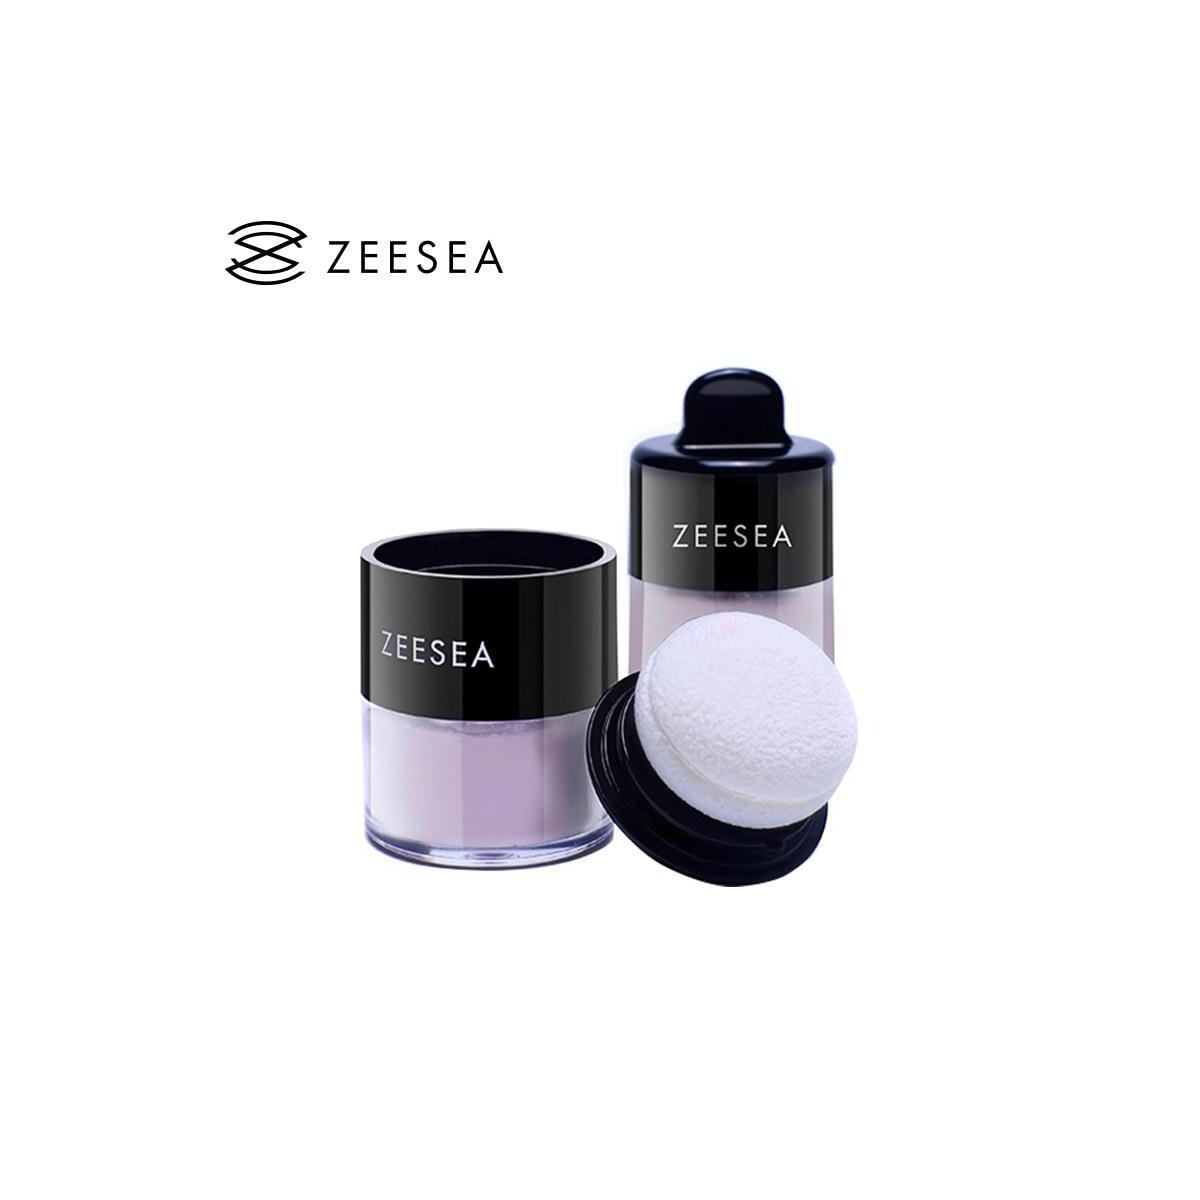 ZEESEA Color Loose Powder Oil Control Concealer, Ivory